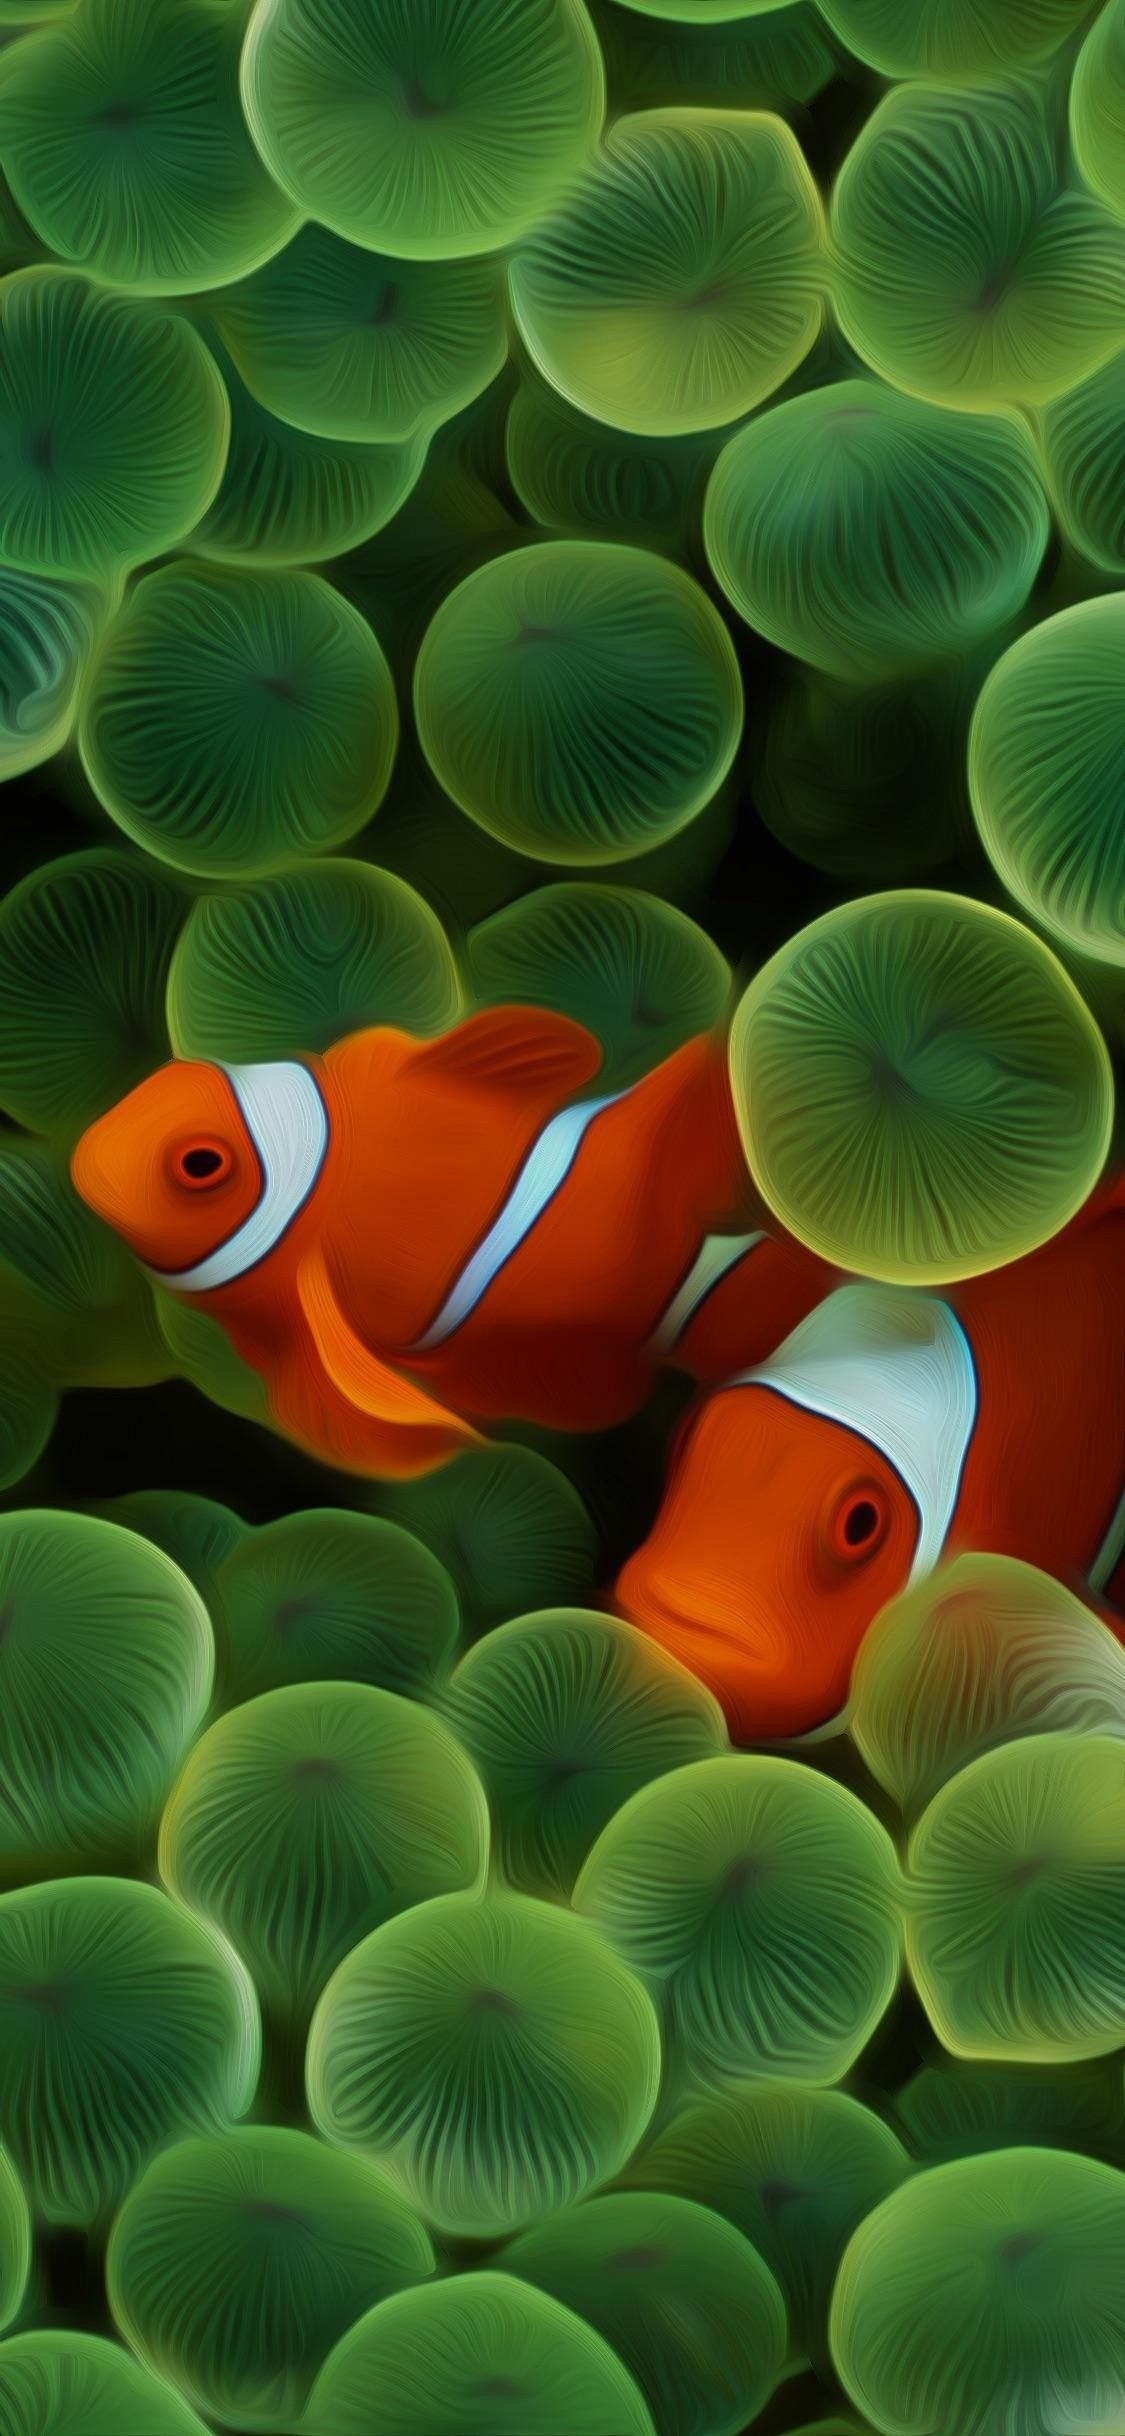 Clownfish Hd Original Ios 11 Iphone X Apple Wallpaper